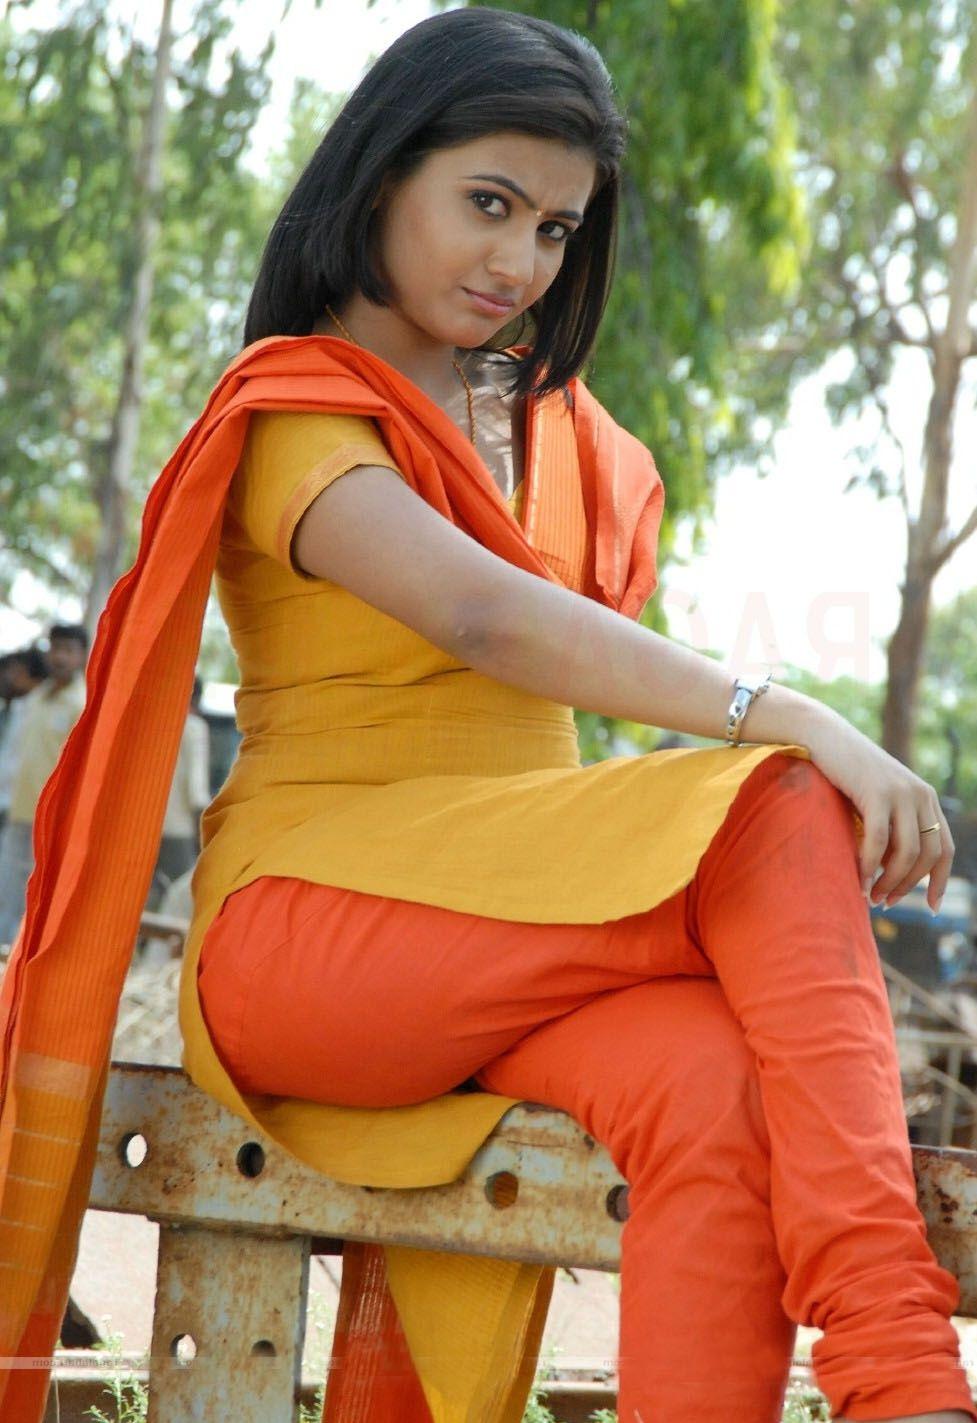 Punjabi girl naughty naked photos nude indian girls